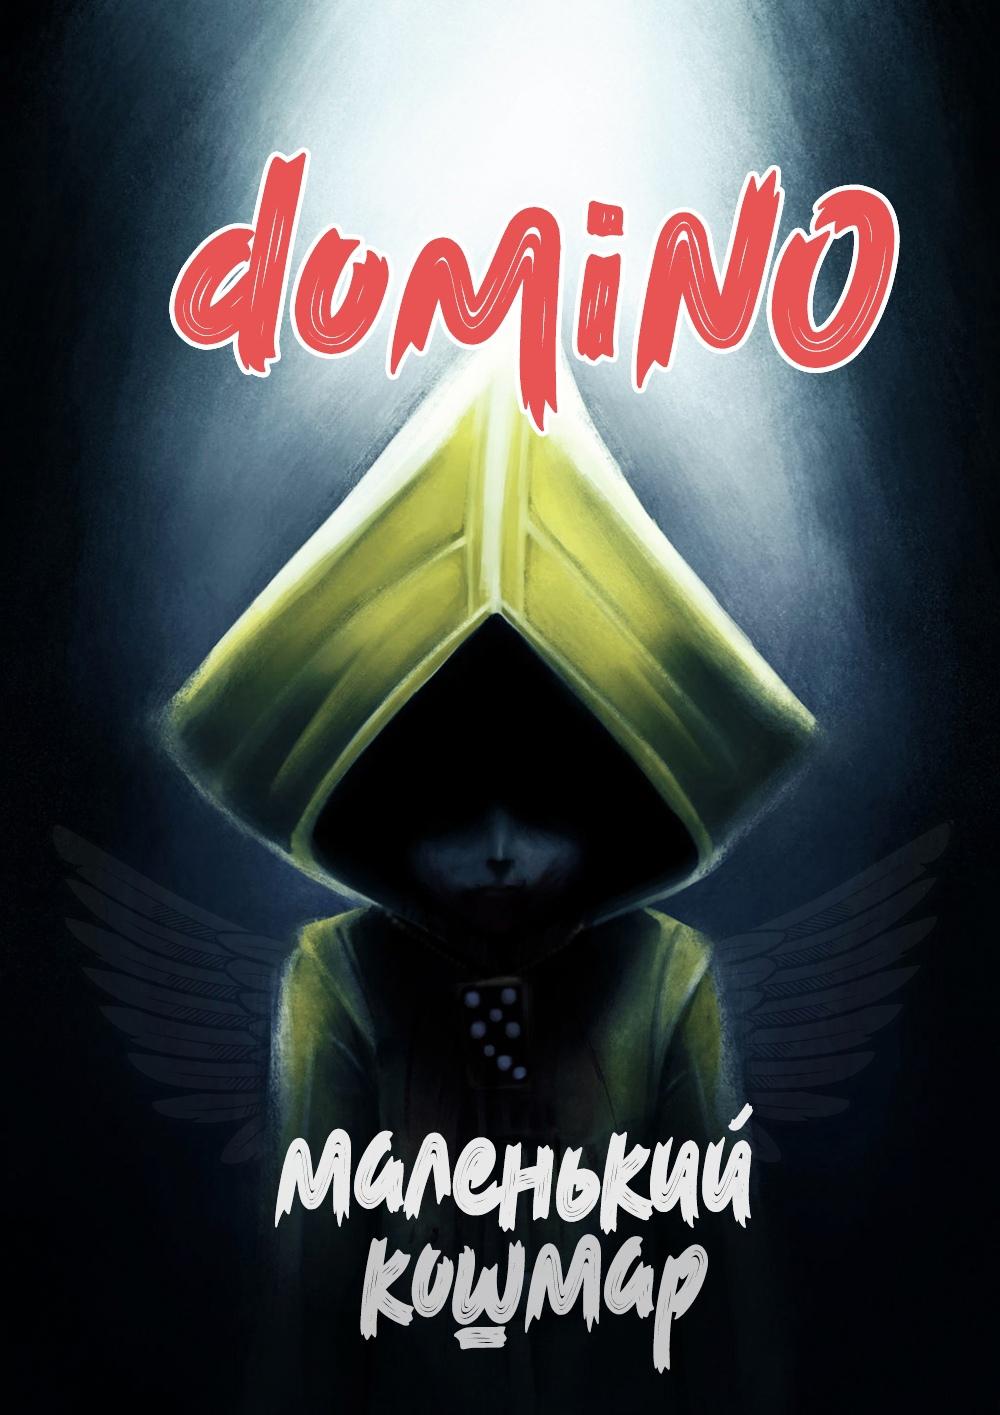 domiNo - Огромный кошмар